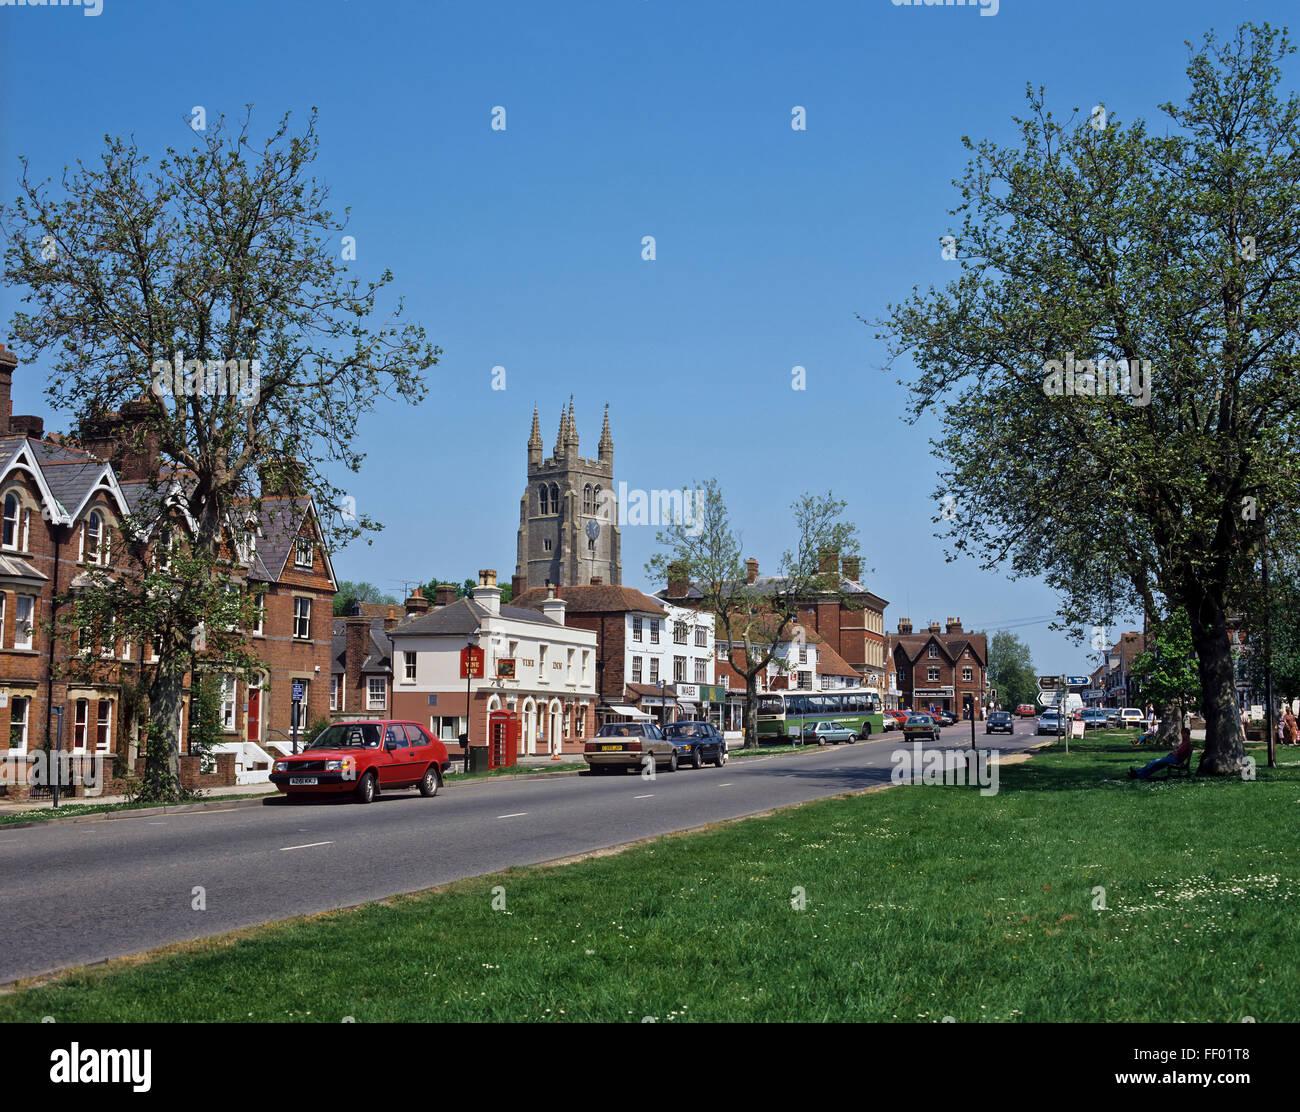 AA 7344. Archival 1990s, High Street, Tenterden, Kent, England - Stock Image